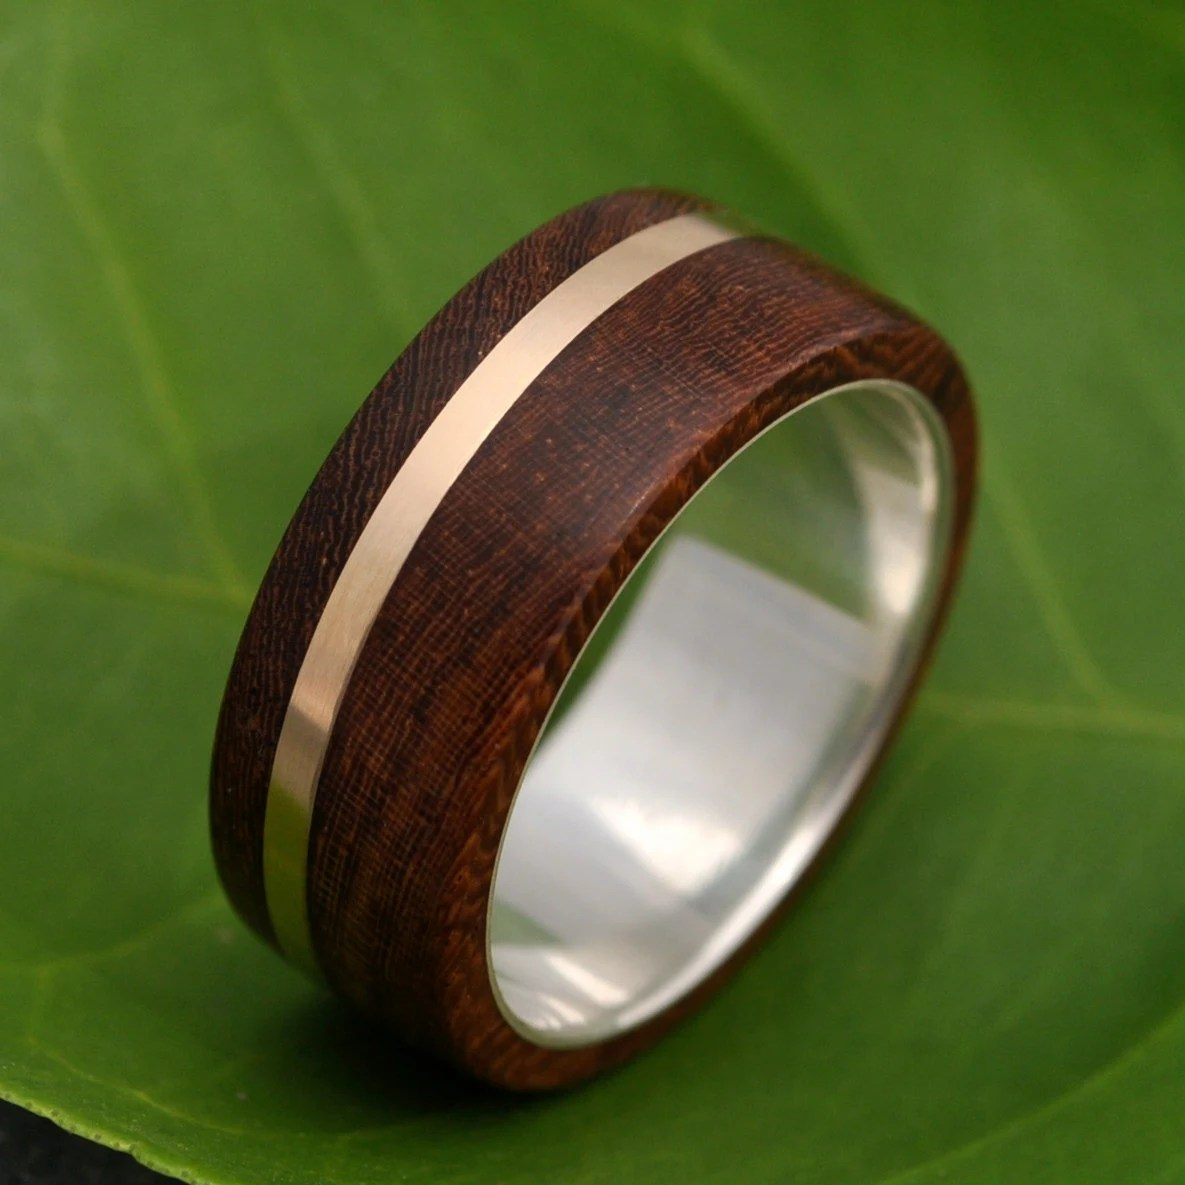 mens wood wedding band solsticio oro wood mens wedding bands wood wedding ring ecofriendly recycled 14k zoom